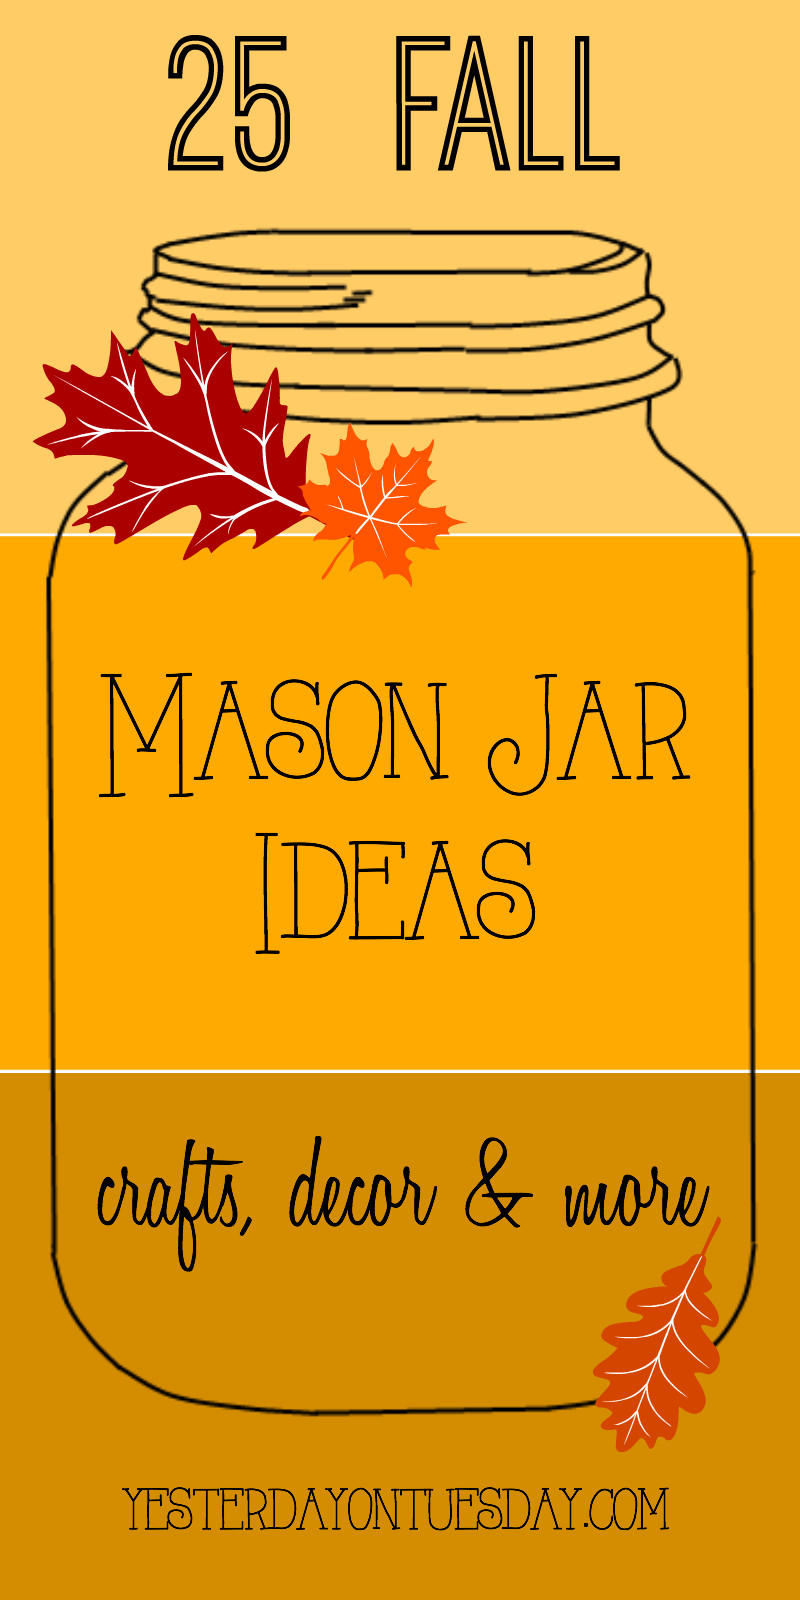 mod podge glitter vase of glam glitter vases throughout 25 fall mason jar ideas